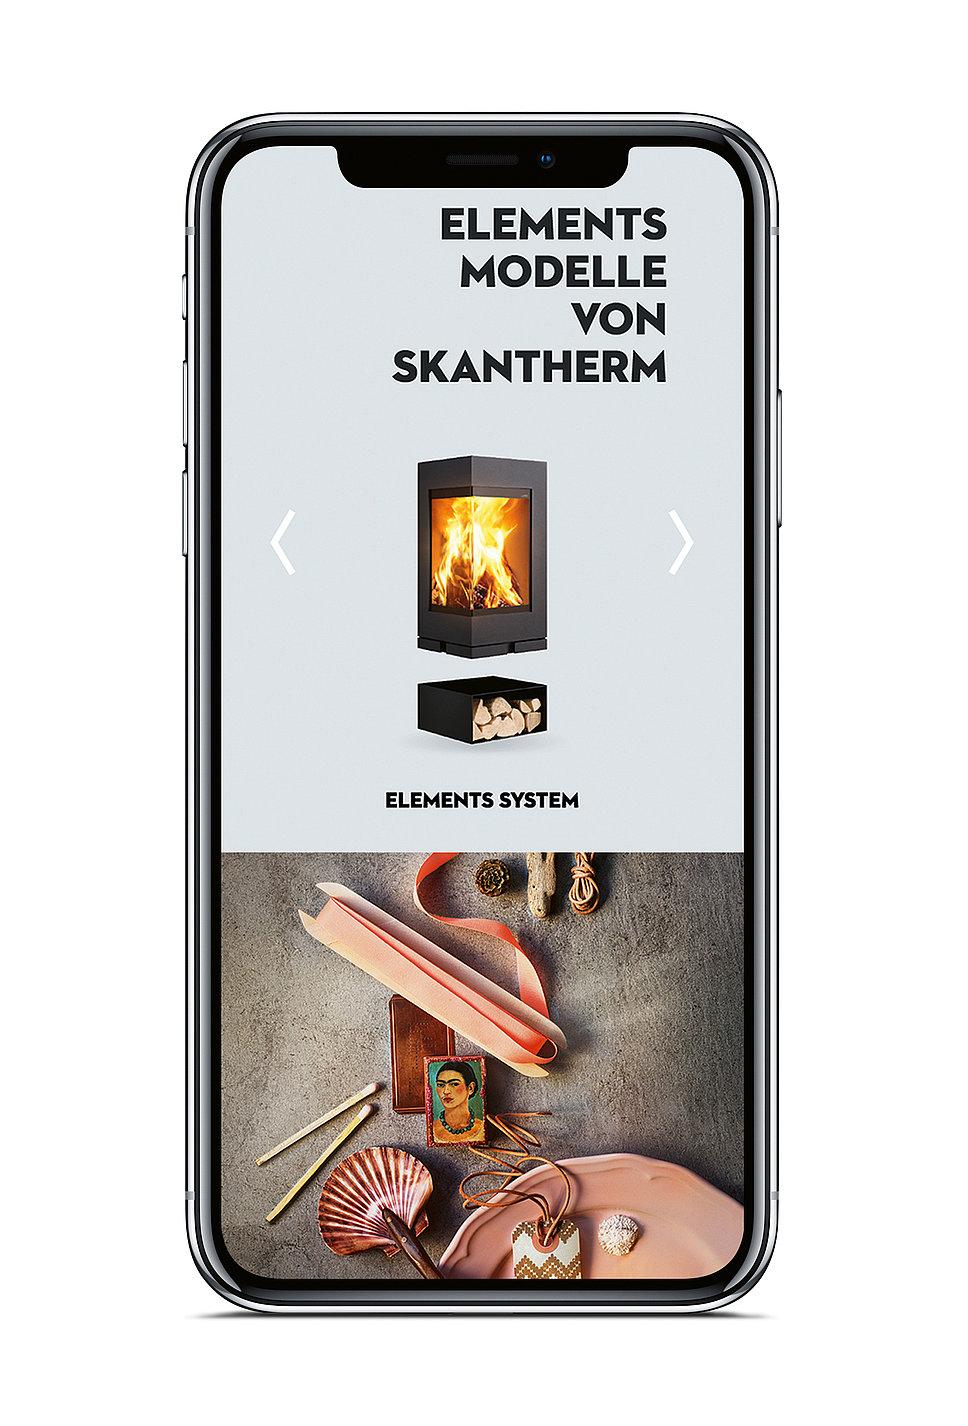 skantherm | Red Dot Design Award